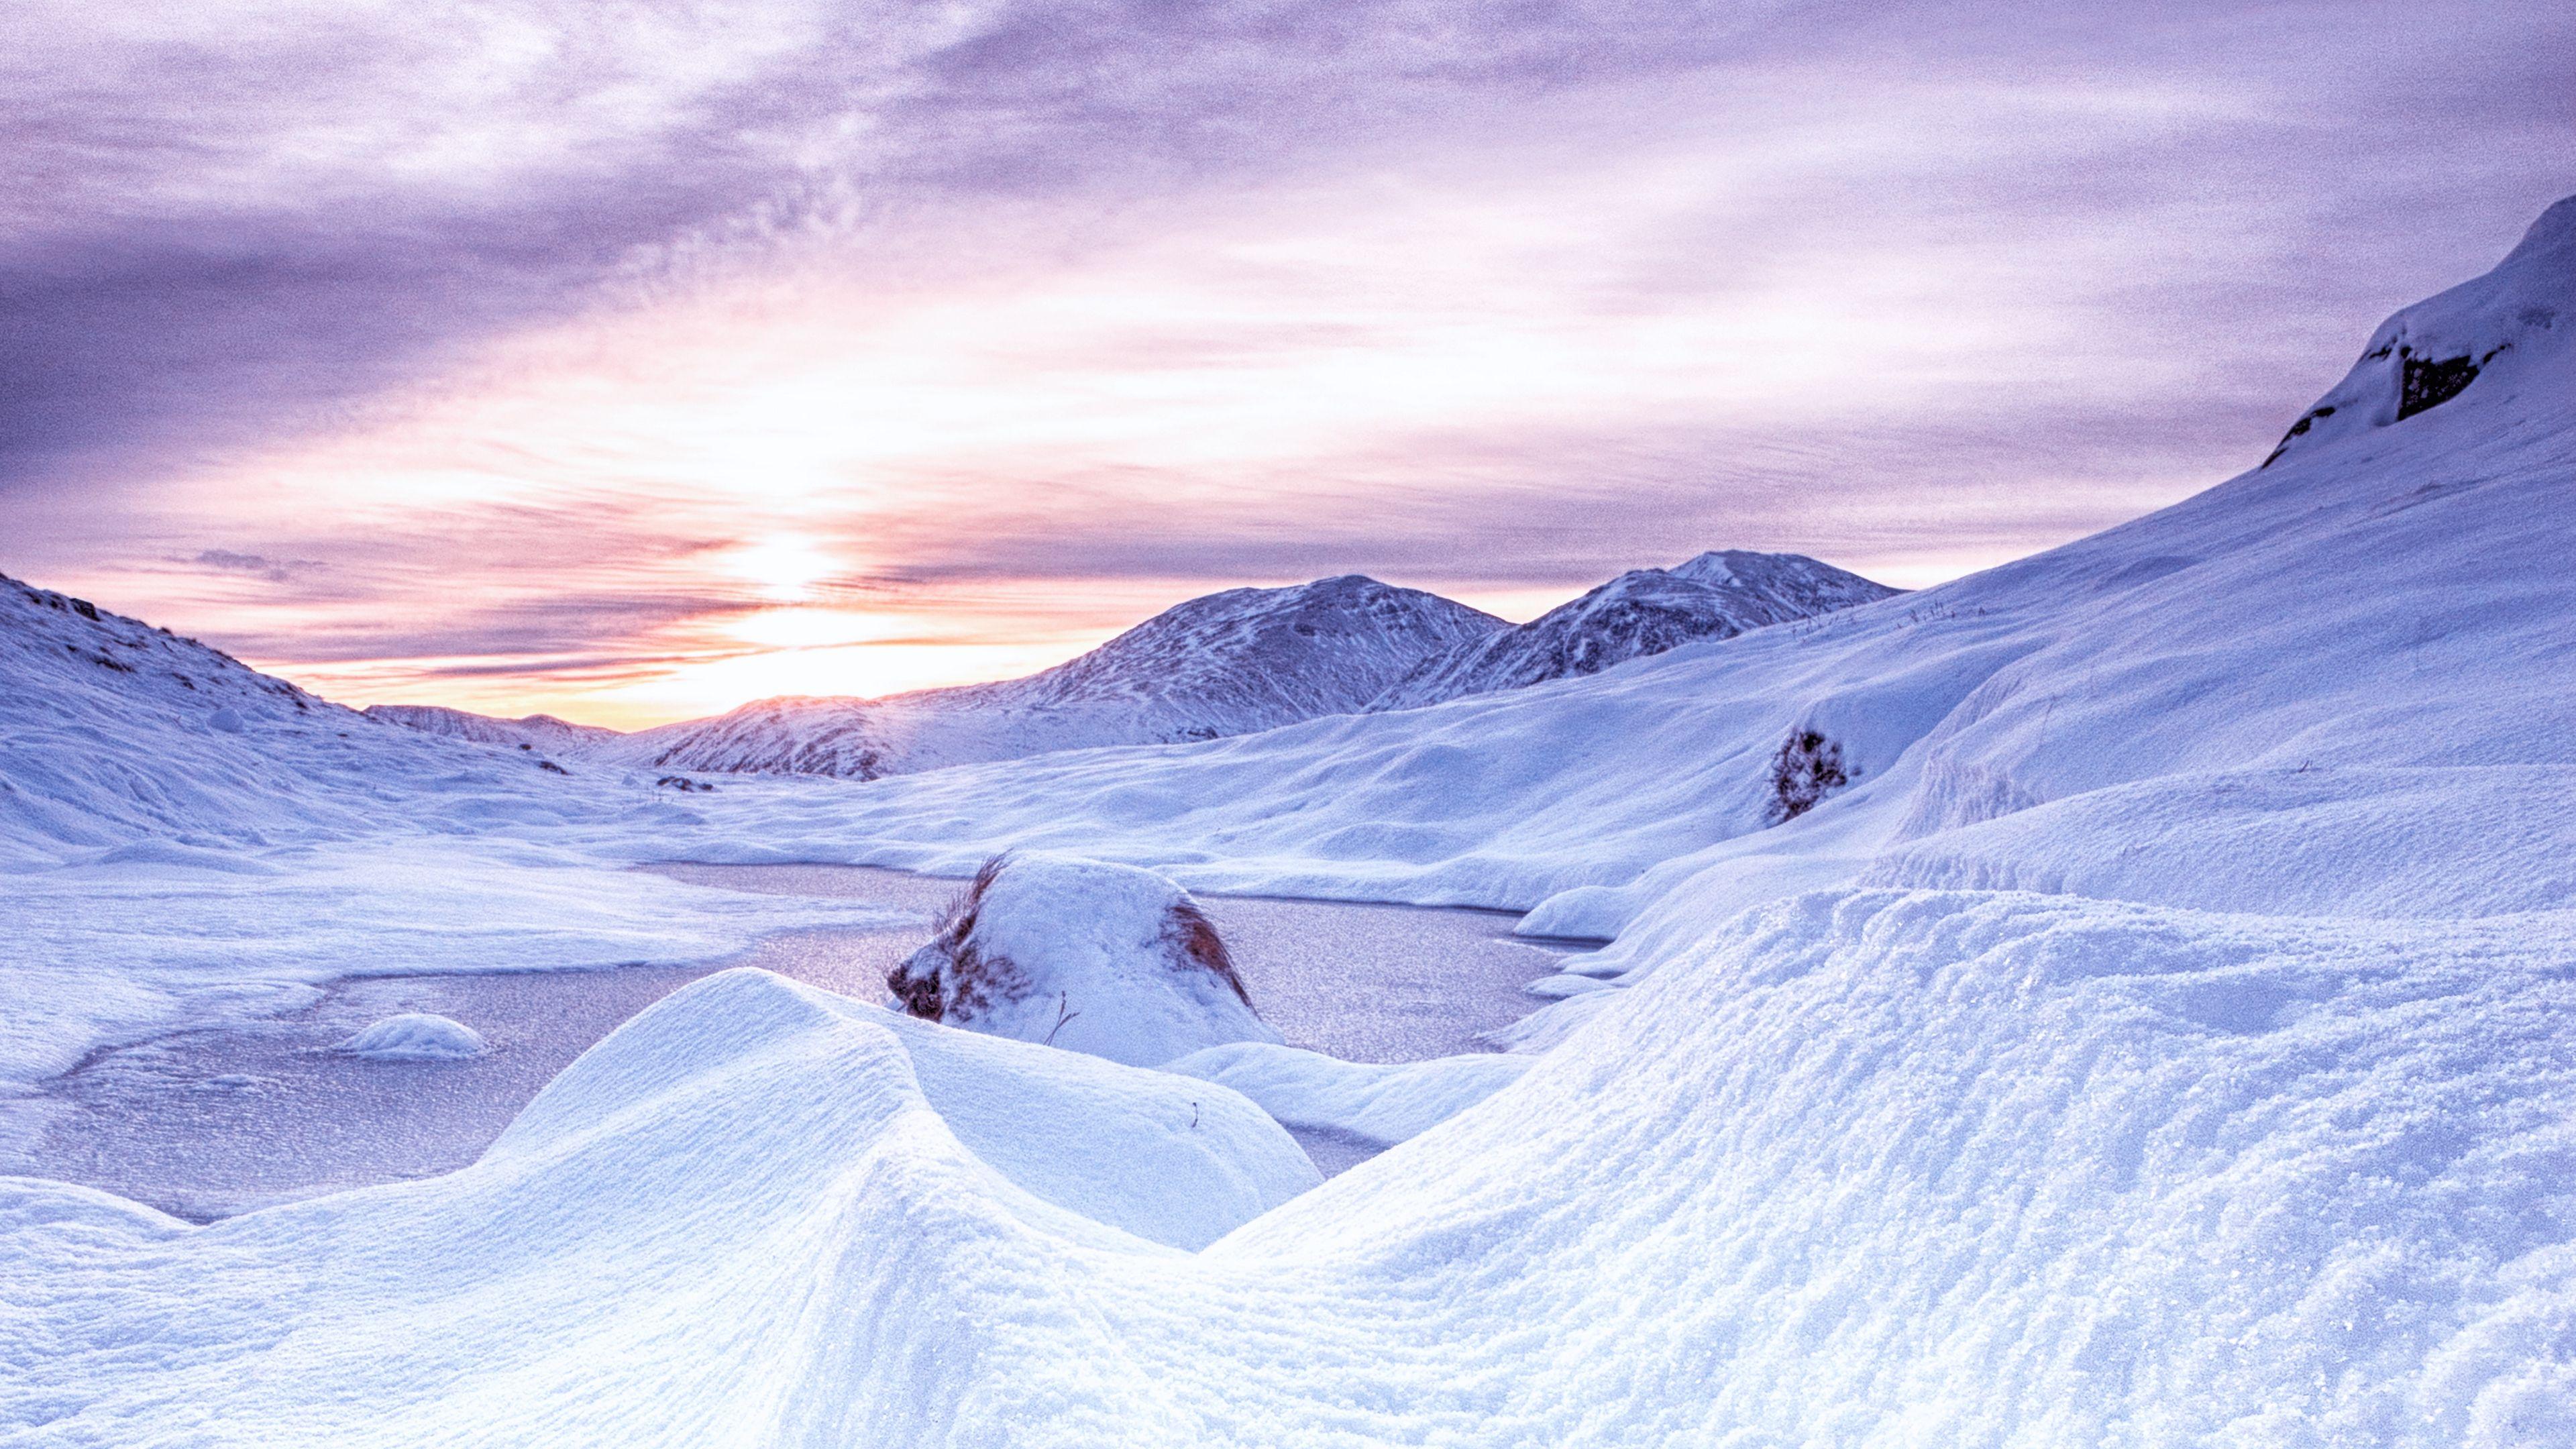 Snow Mountains Dawn Scotland 4k Snow Mountains Dawn Winter Wallpaper Backgrounds Desktop Snow